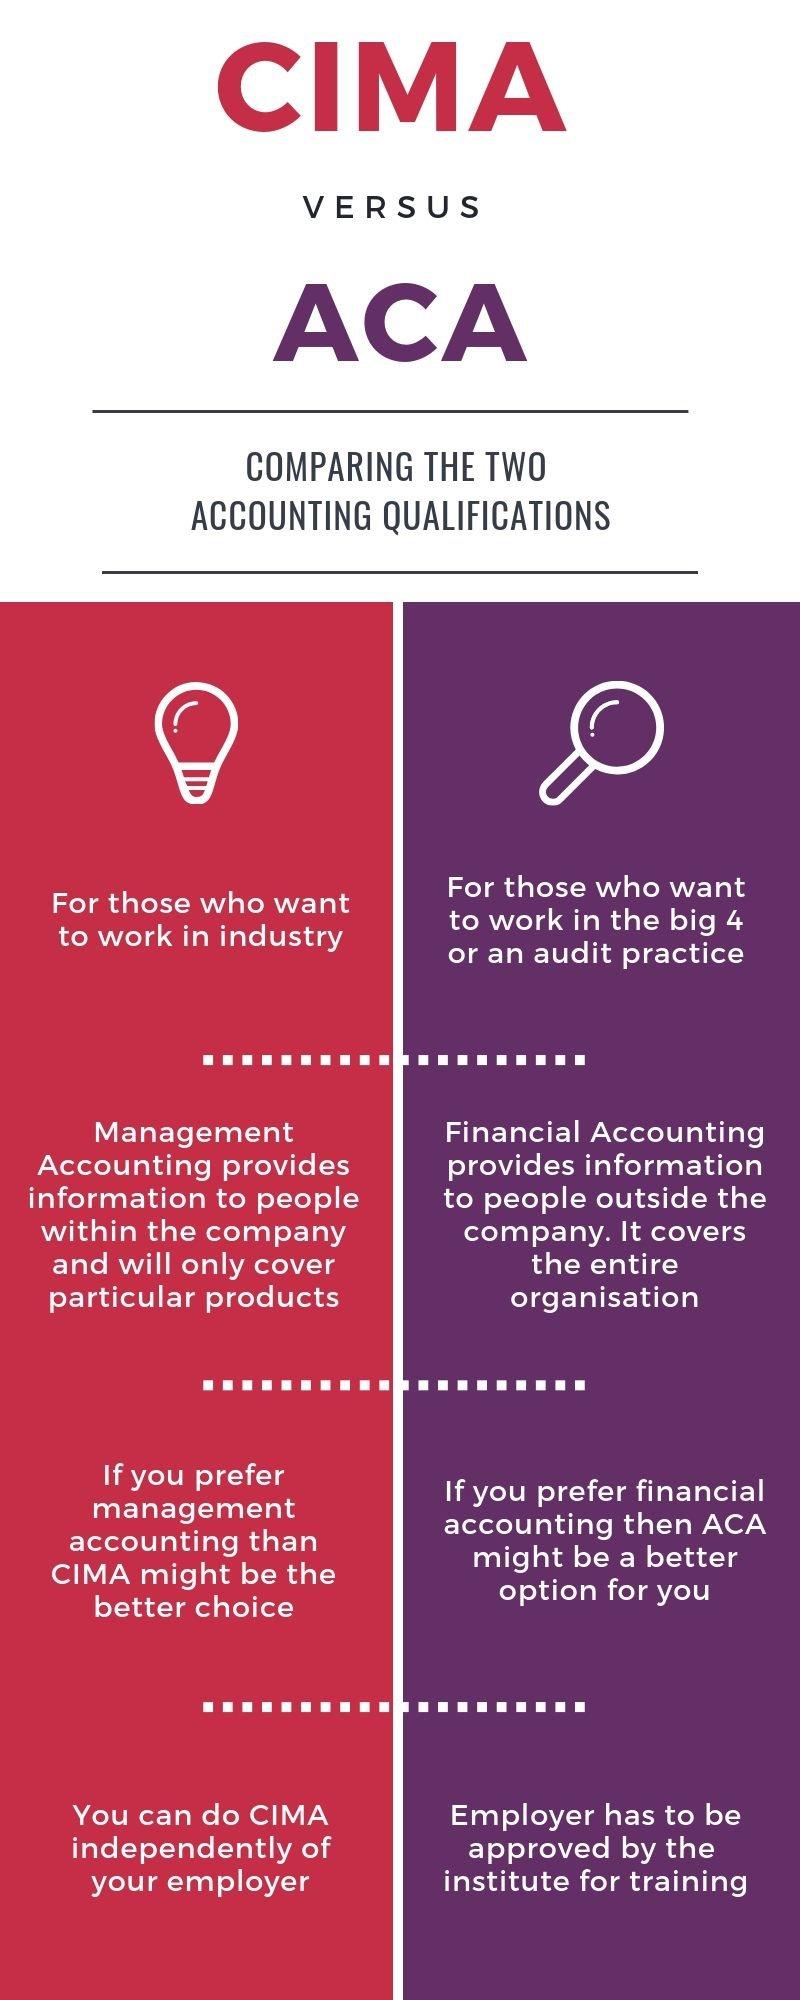 CIMA vs ACA Infographic 1